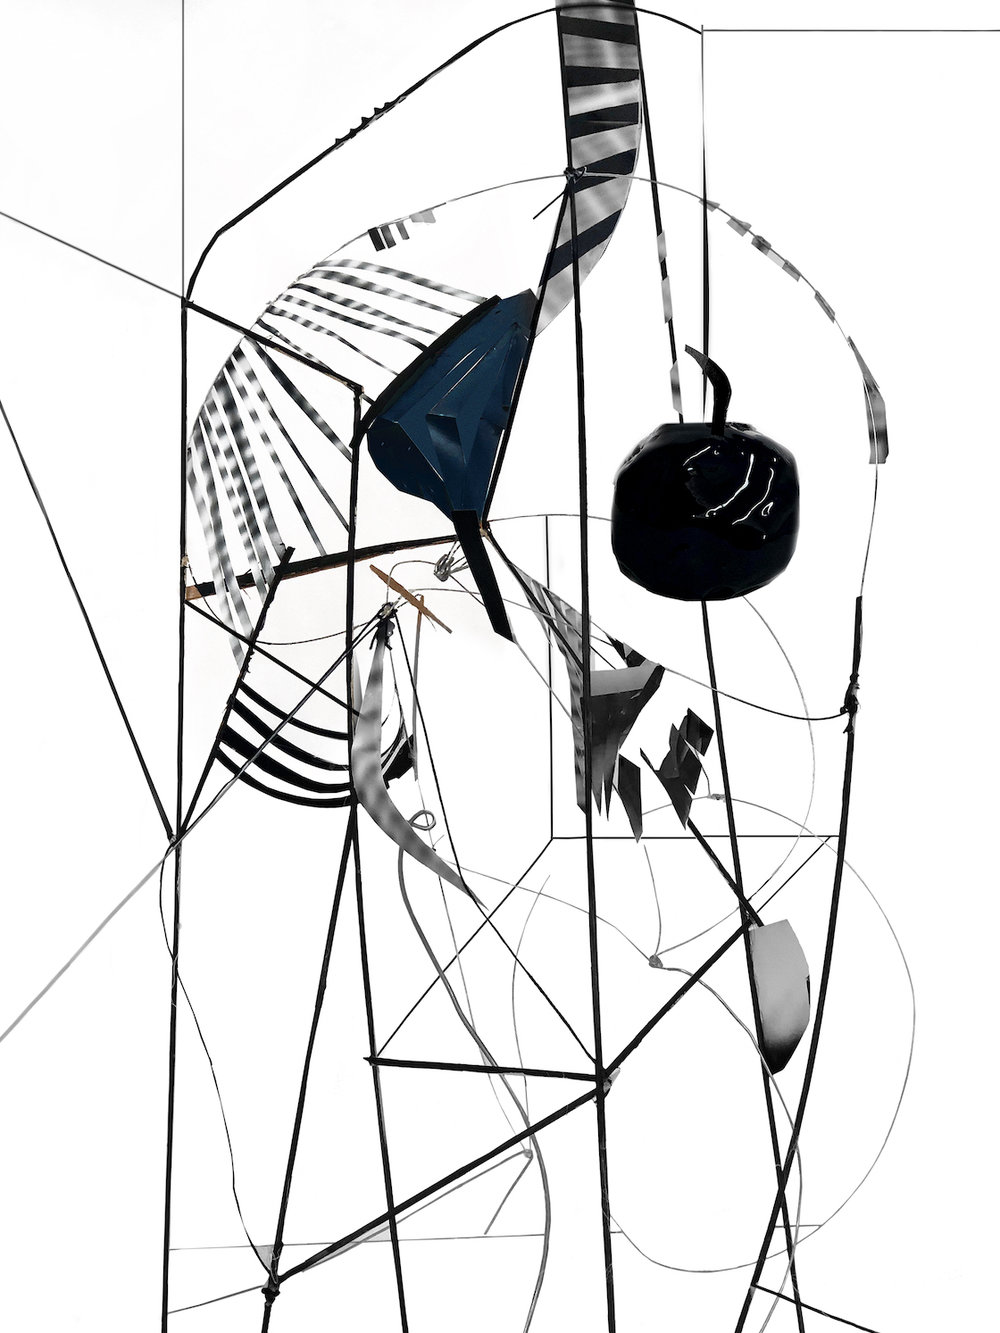 Yamini Nayar,  Wing-Bone , 2018, Hahnemühle Bartya Pigment Print, 40 x 30 inches (101.6 x 76.2 cm), Edition of 5 + 2AP